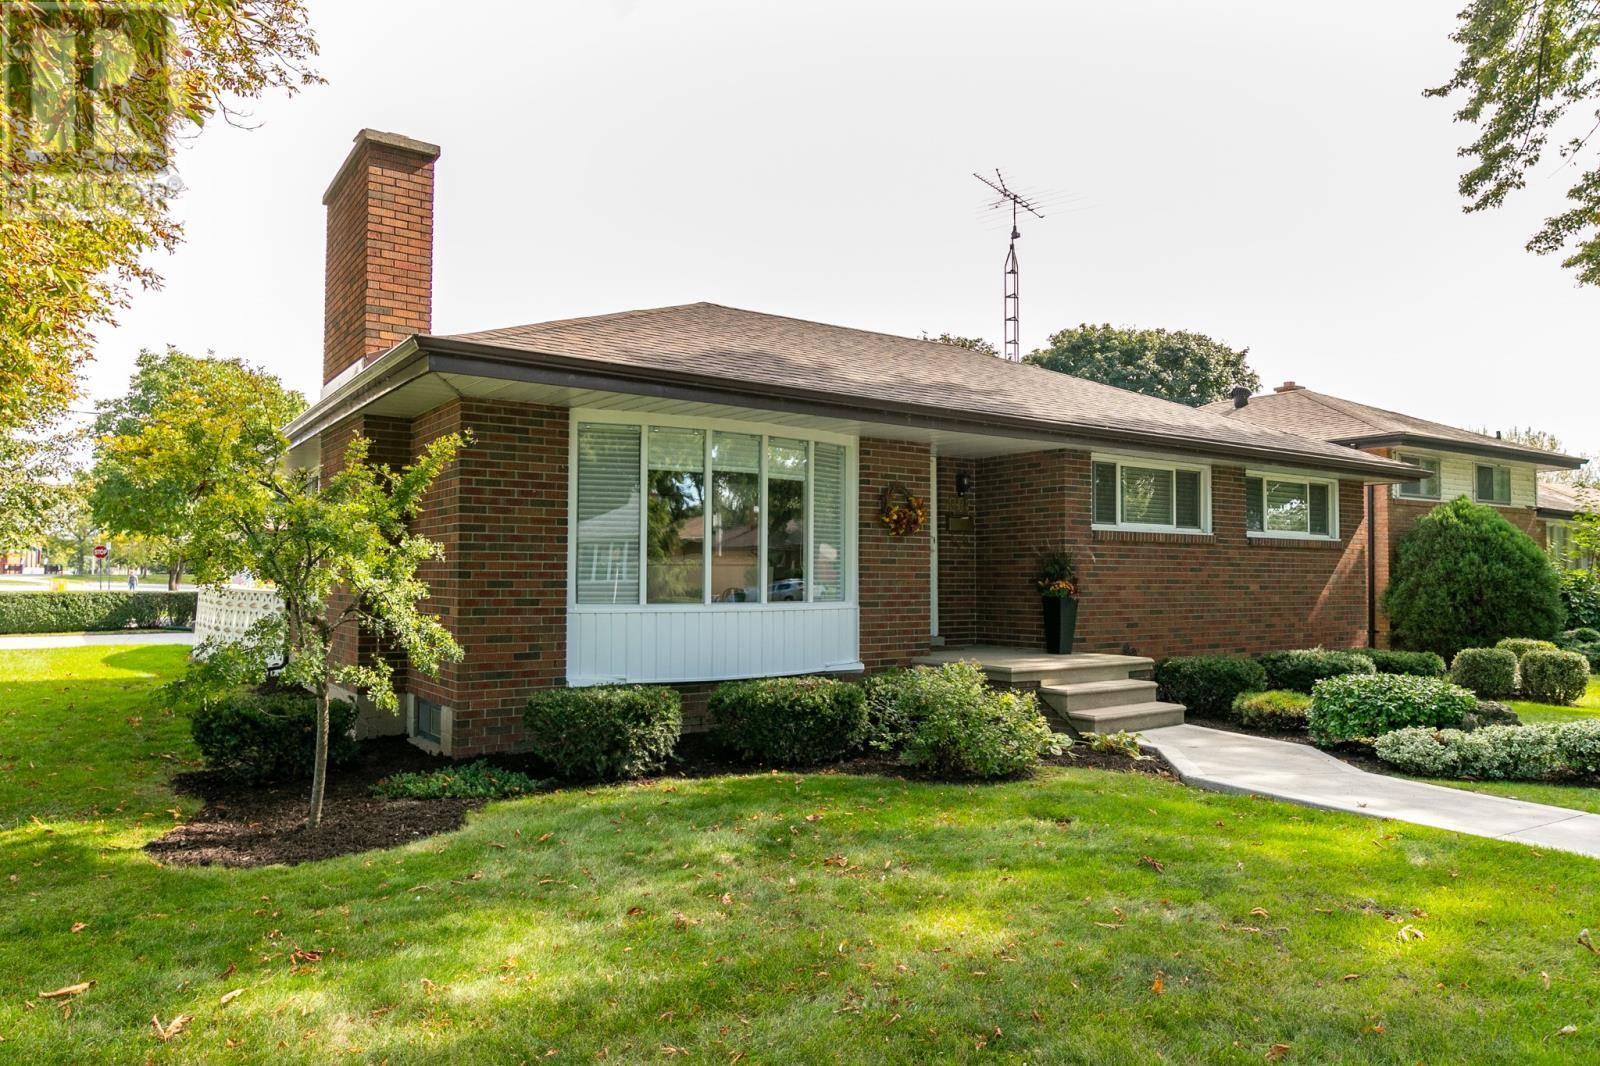 House for sale at 408 Greendale  Windsor Ontario - MLS: 19026600